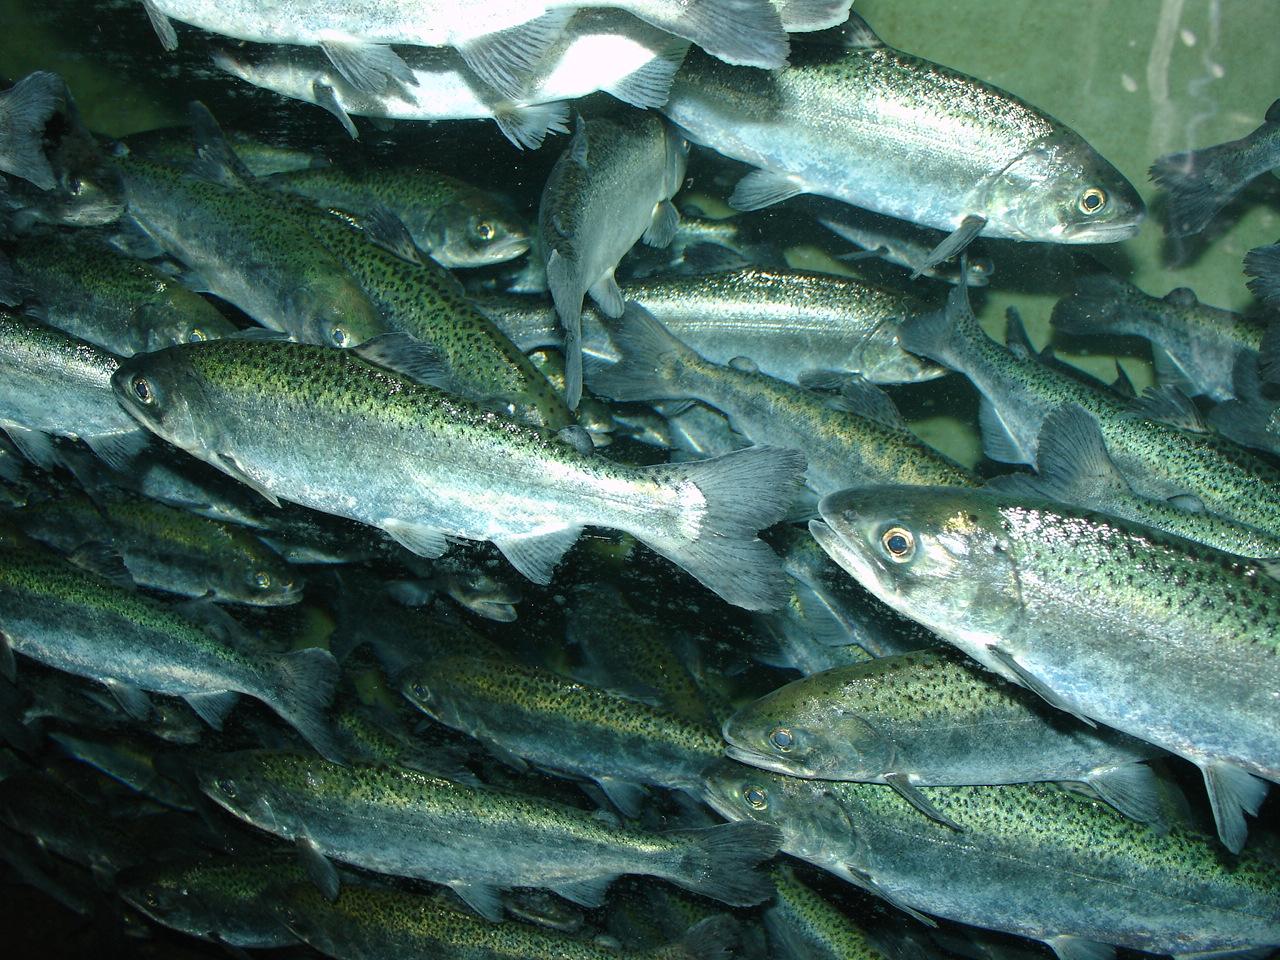 Salmons swimming wallpaper